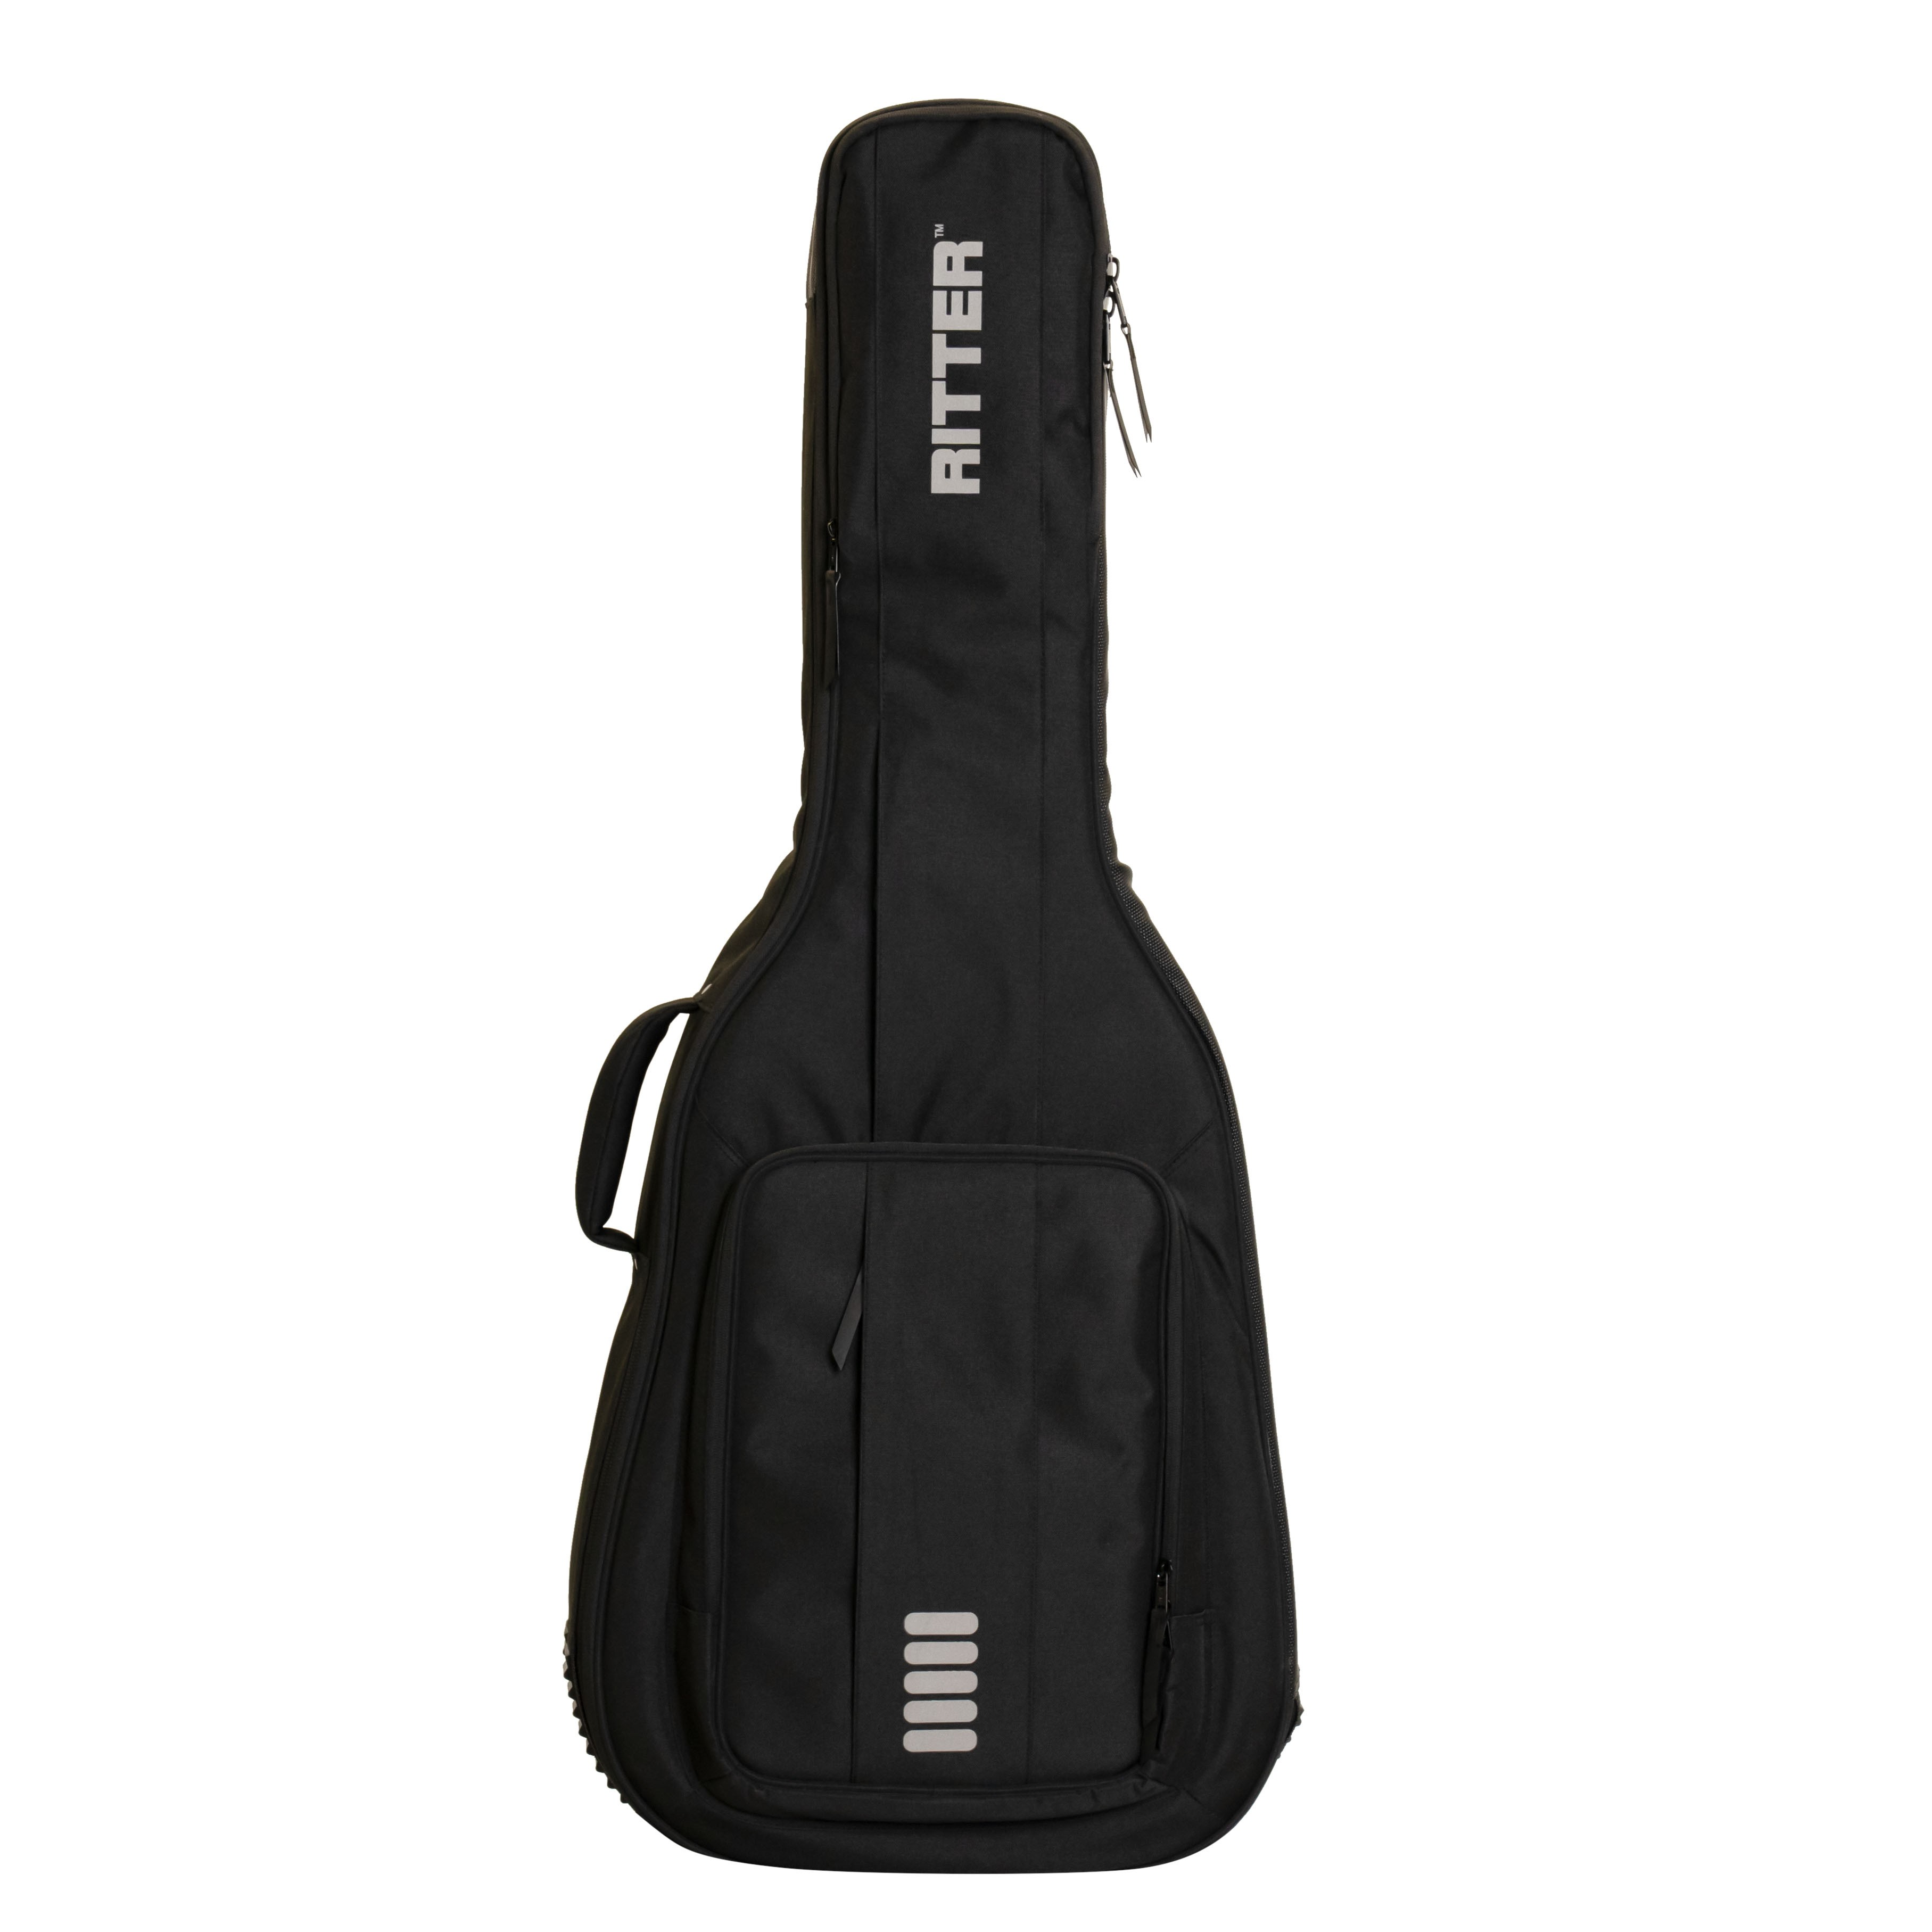 Ritter Arosa Dreadnought Acoustic Guitar Bag - Sea Ground Black (RGA5-D)